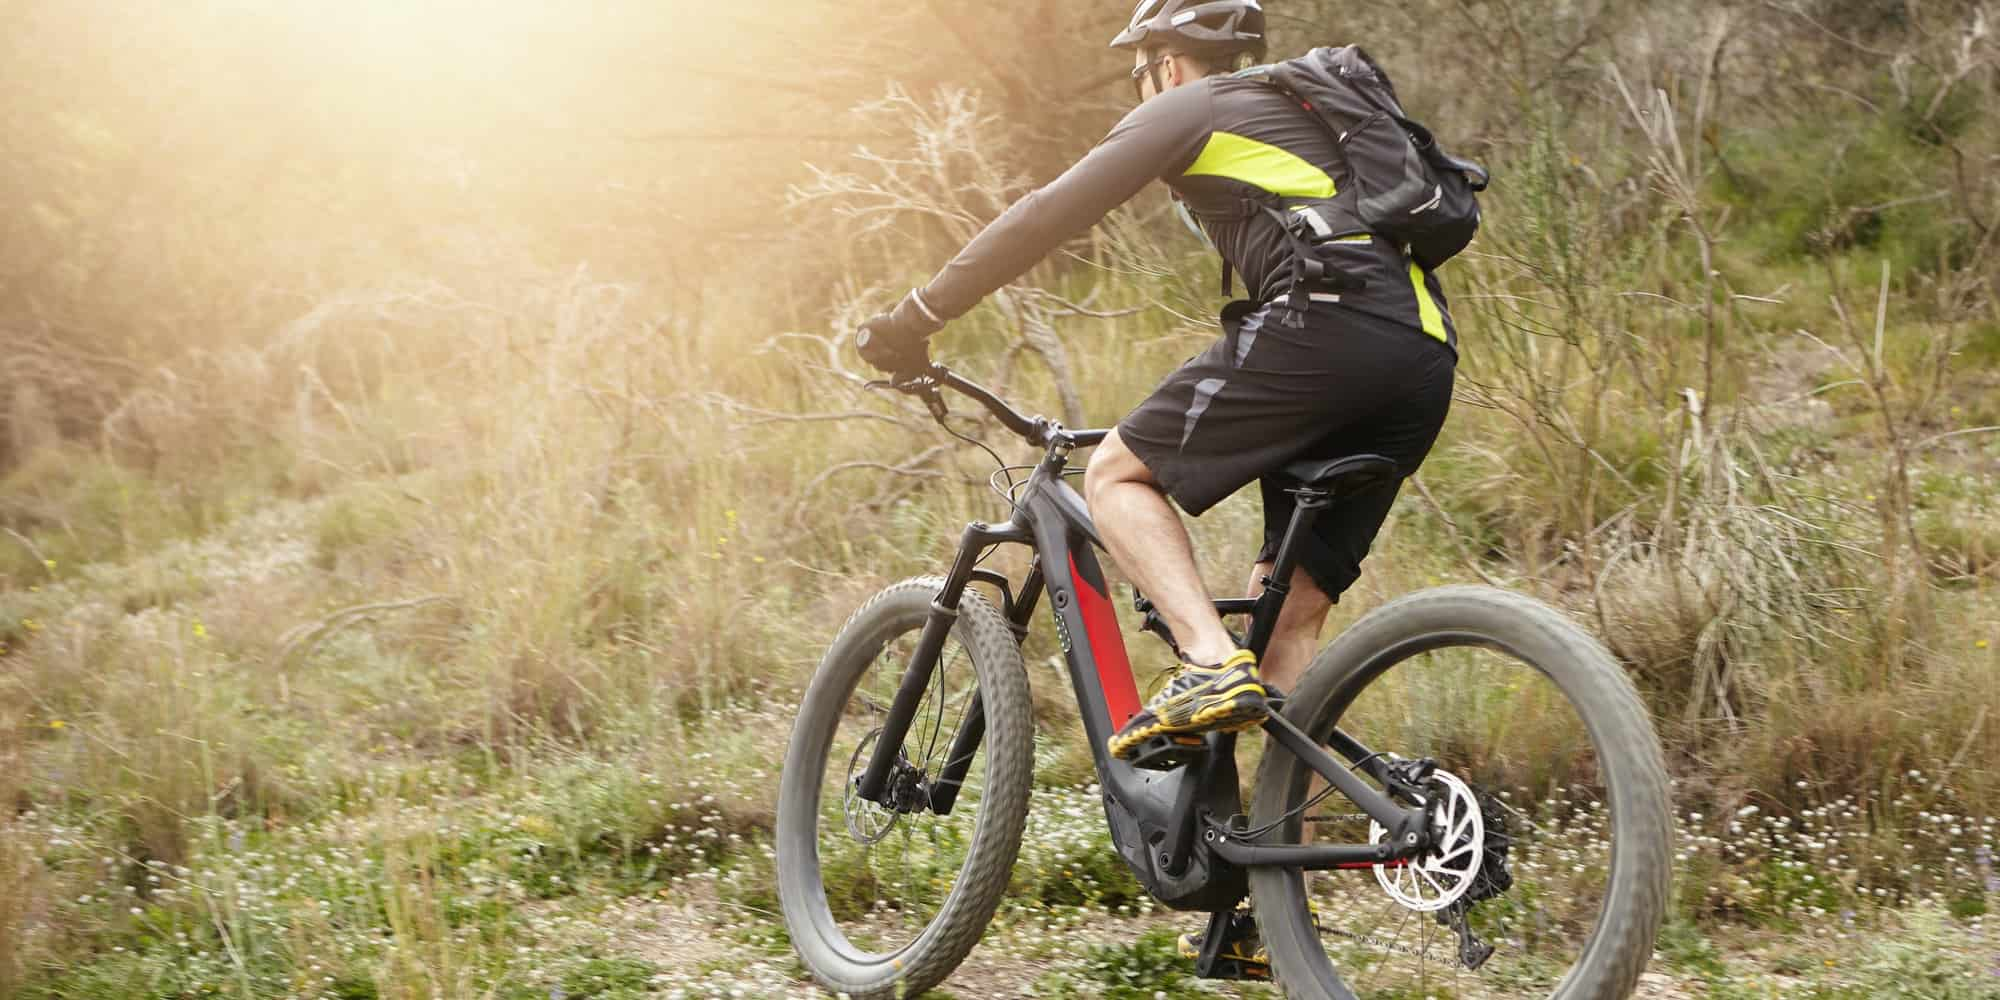 Best Electric Bike Under $1000 in 2020 - Top 10 Bikes ...